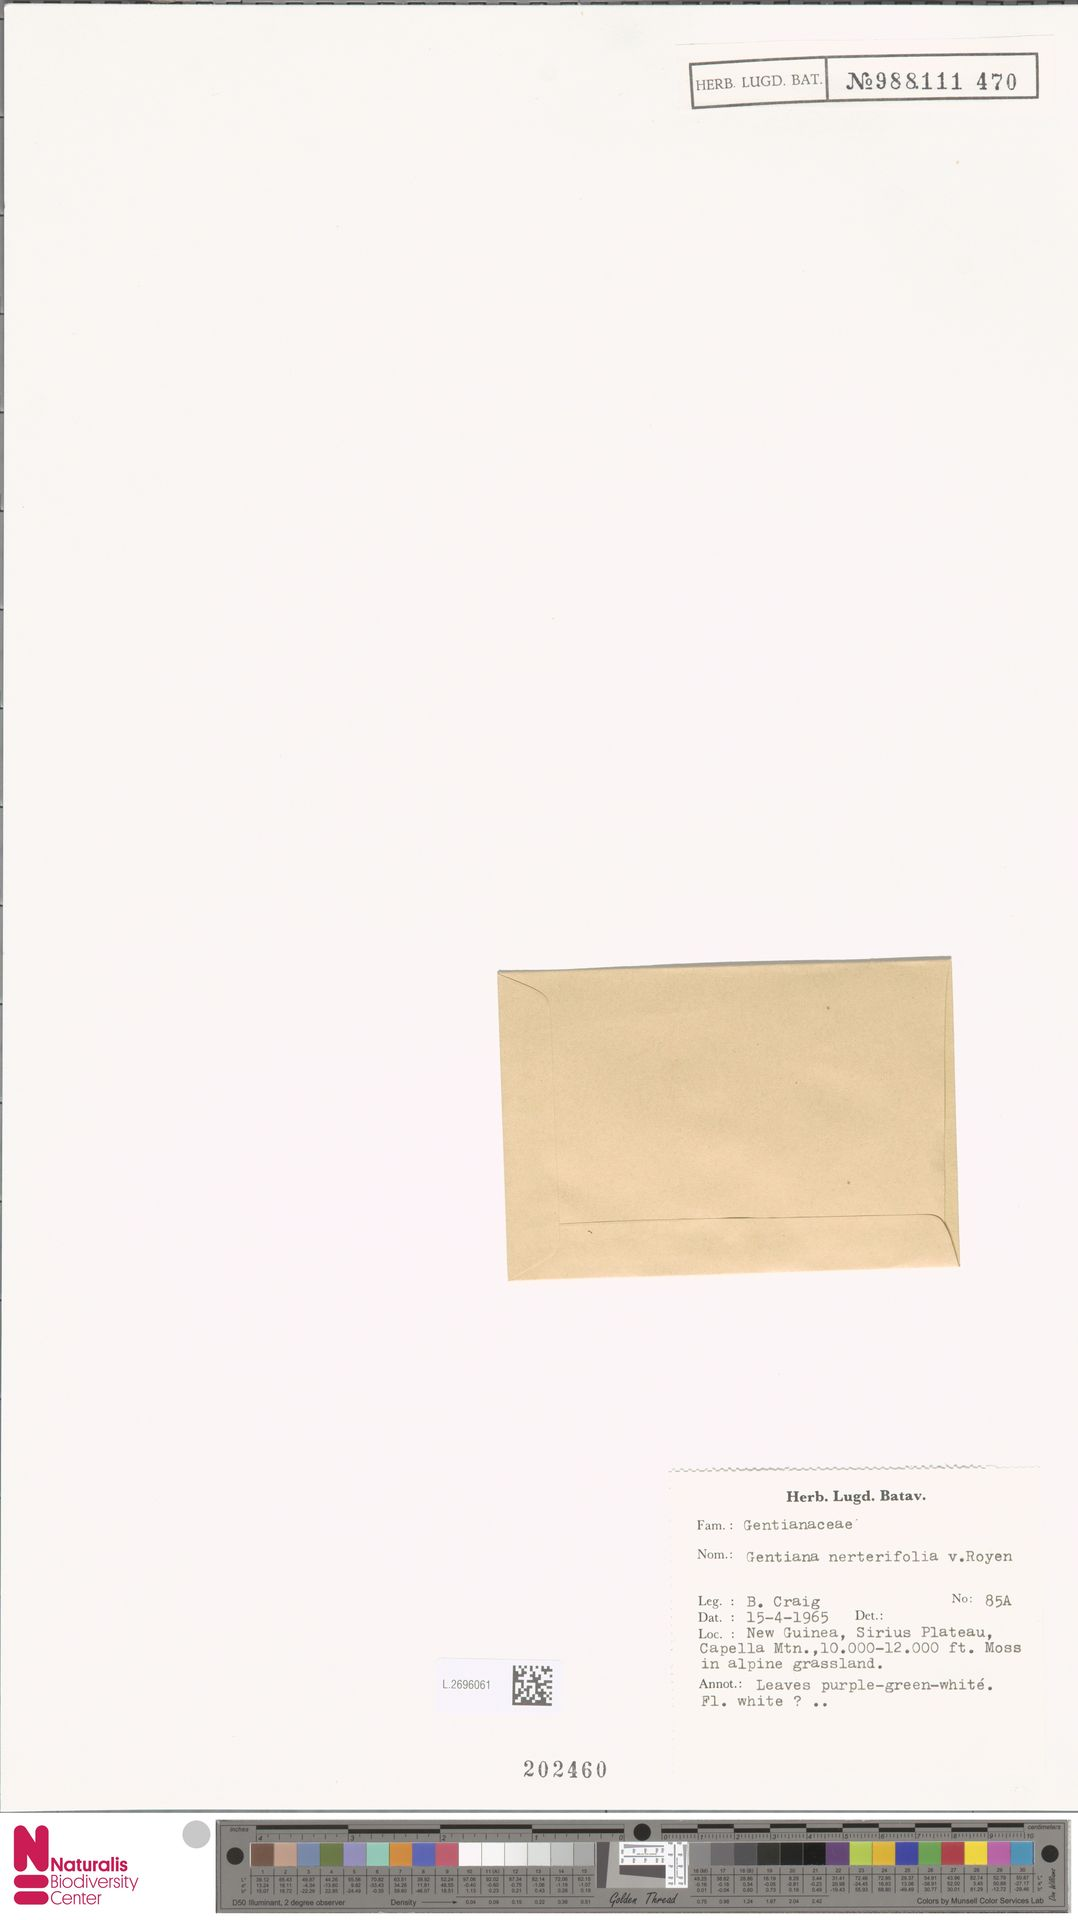 L.2696061 | Gentiana nerterifolia P.Royen